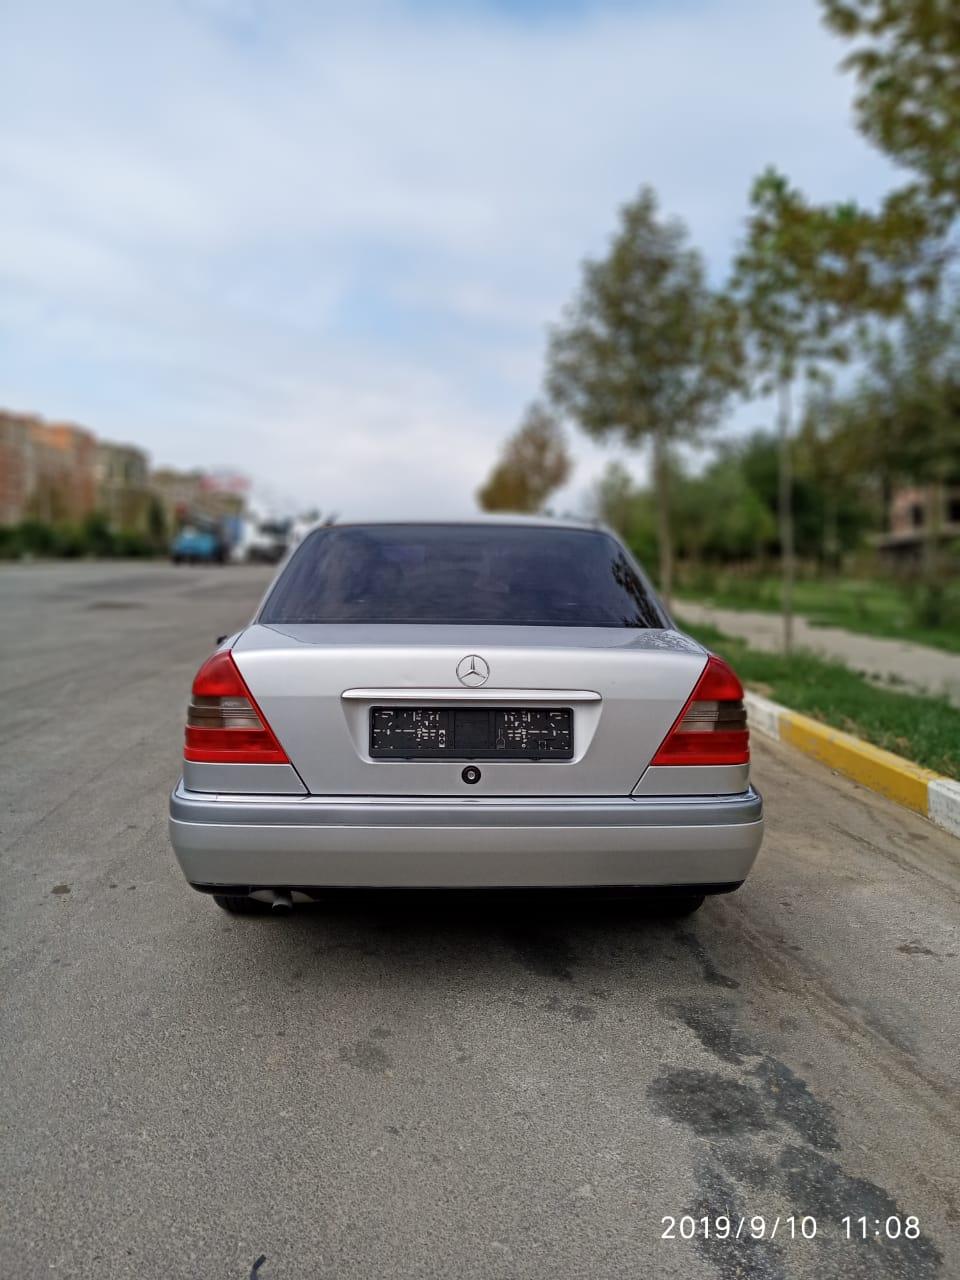 Mercedes-Benz C 180 1.8(lt) 1994 İkinci əl  $4800